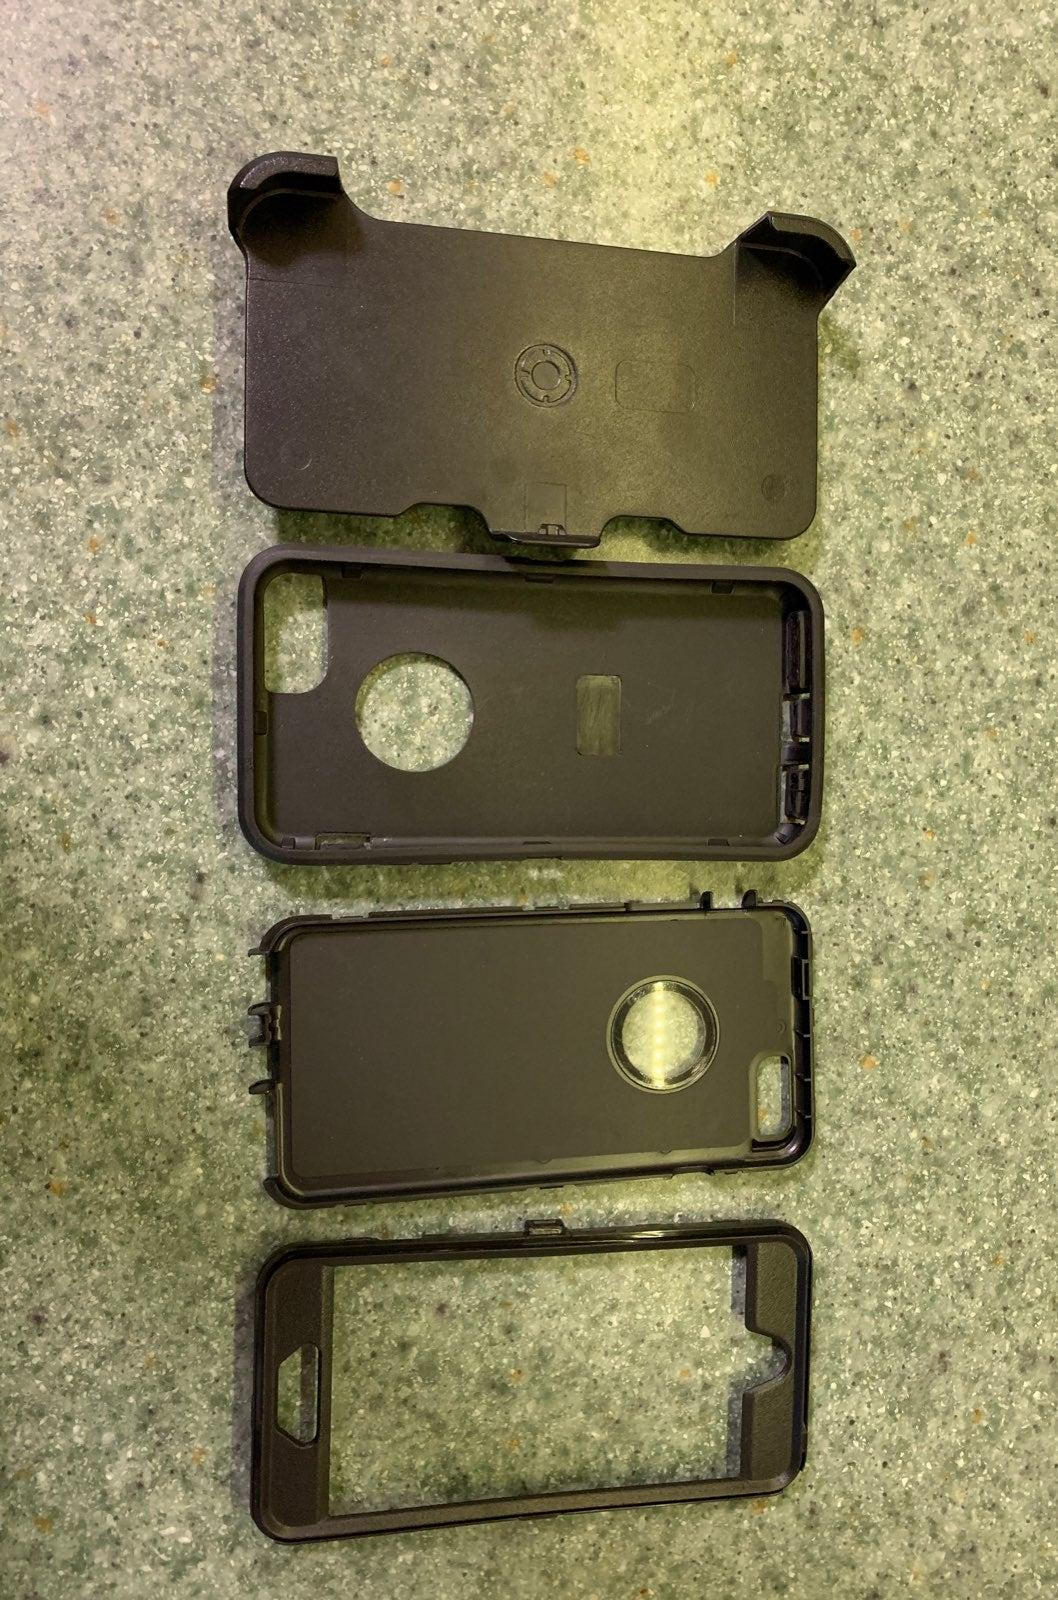 FOGEEK iPhone 6S Plus Case, Protective c